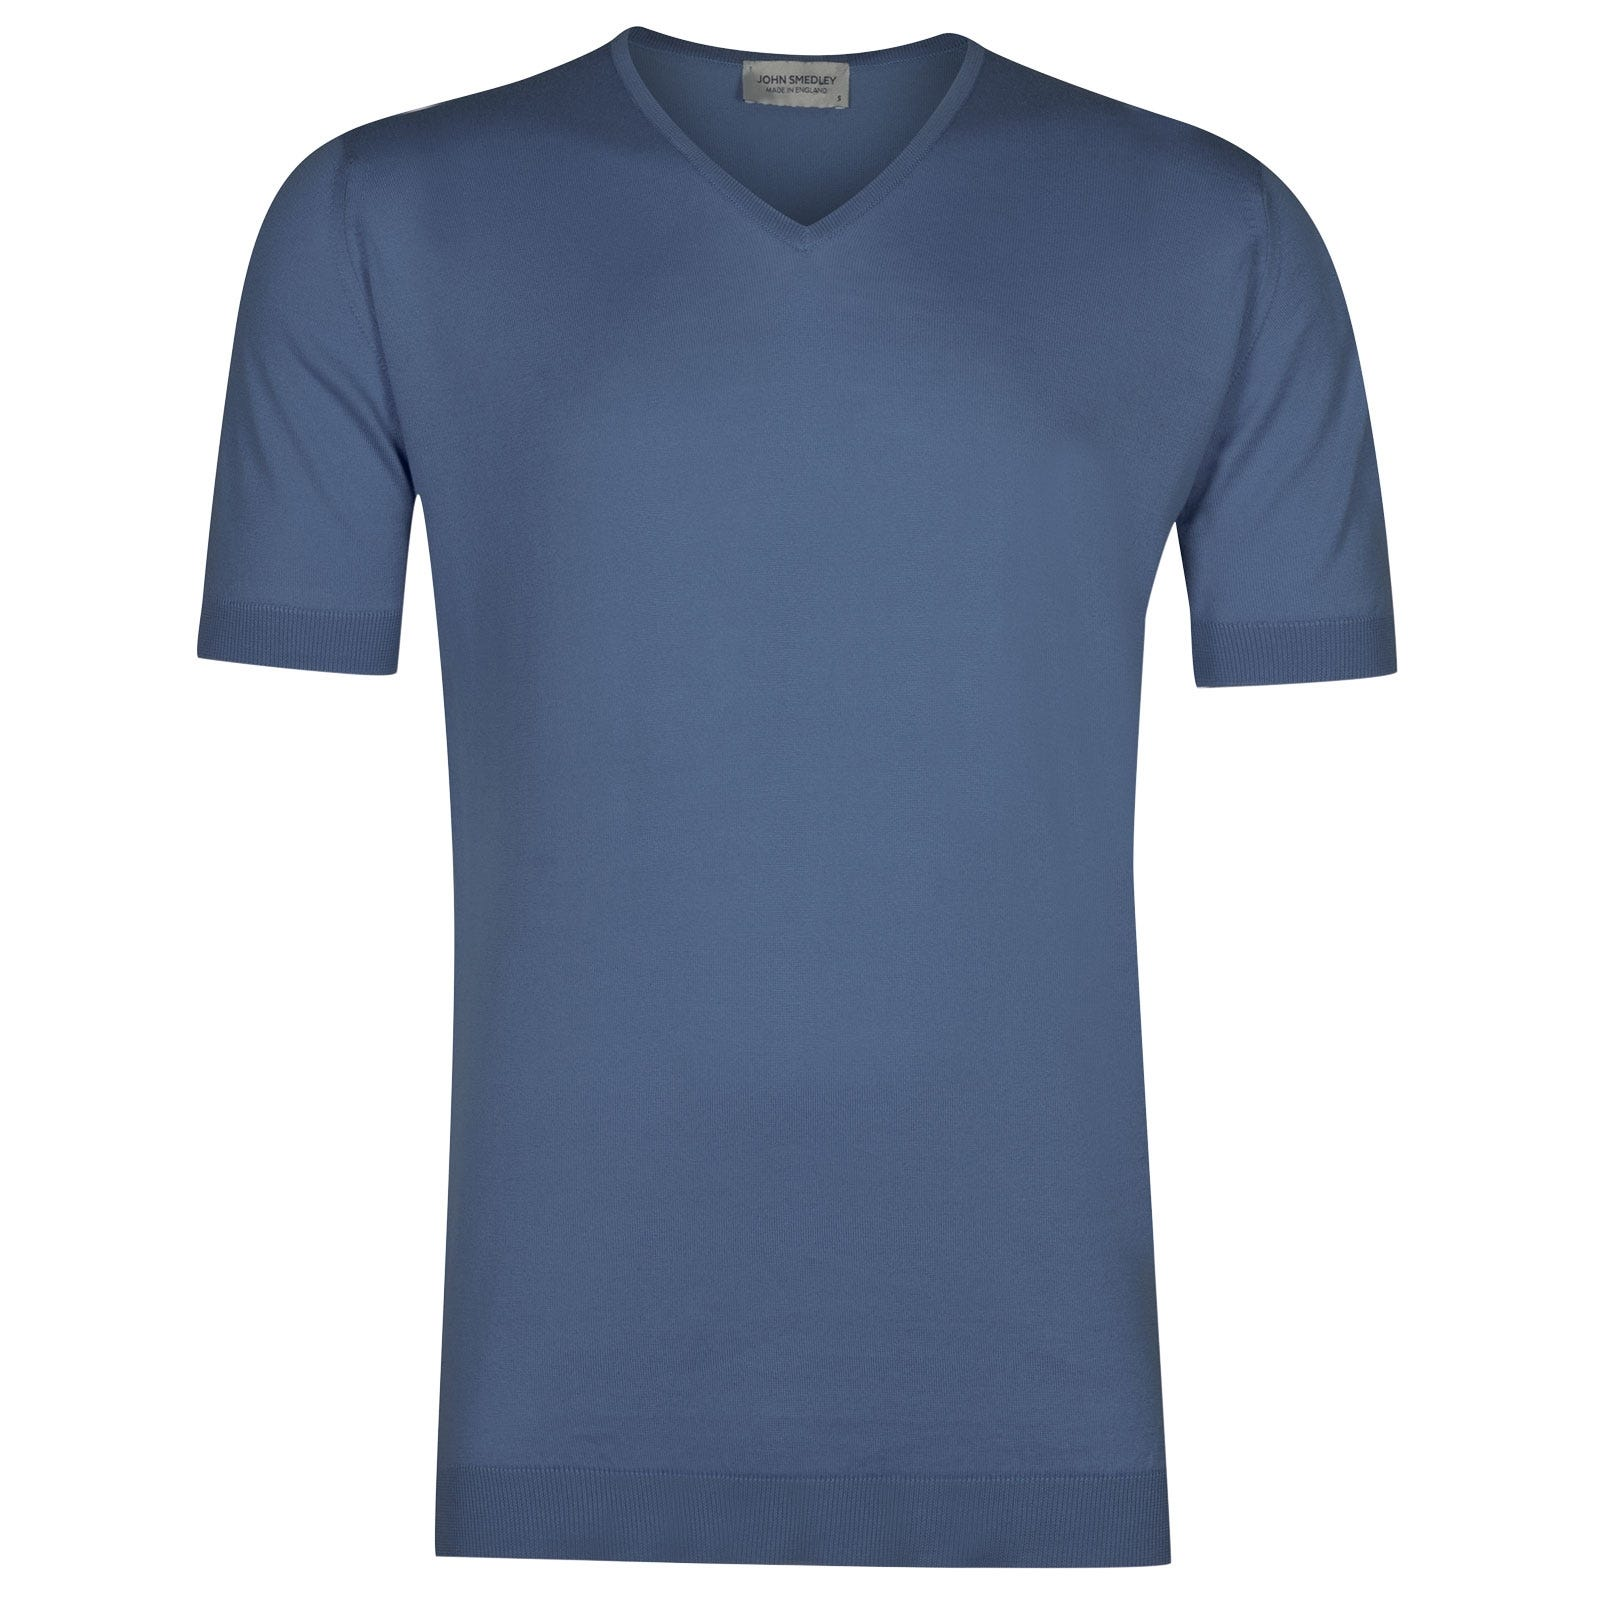 John Smedley Braedon in Blue Iris T-Shirt-MED